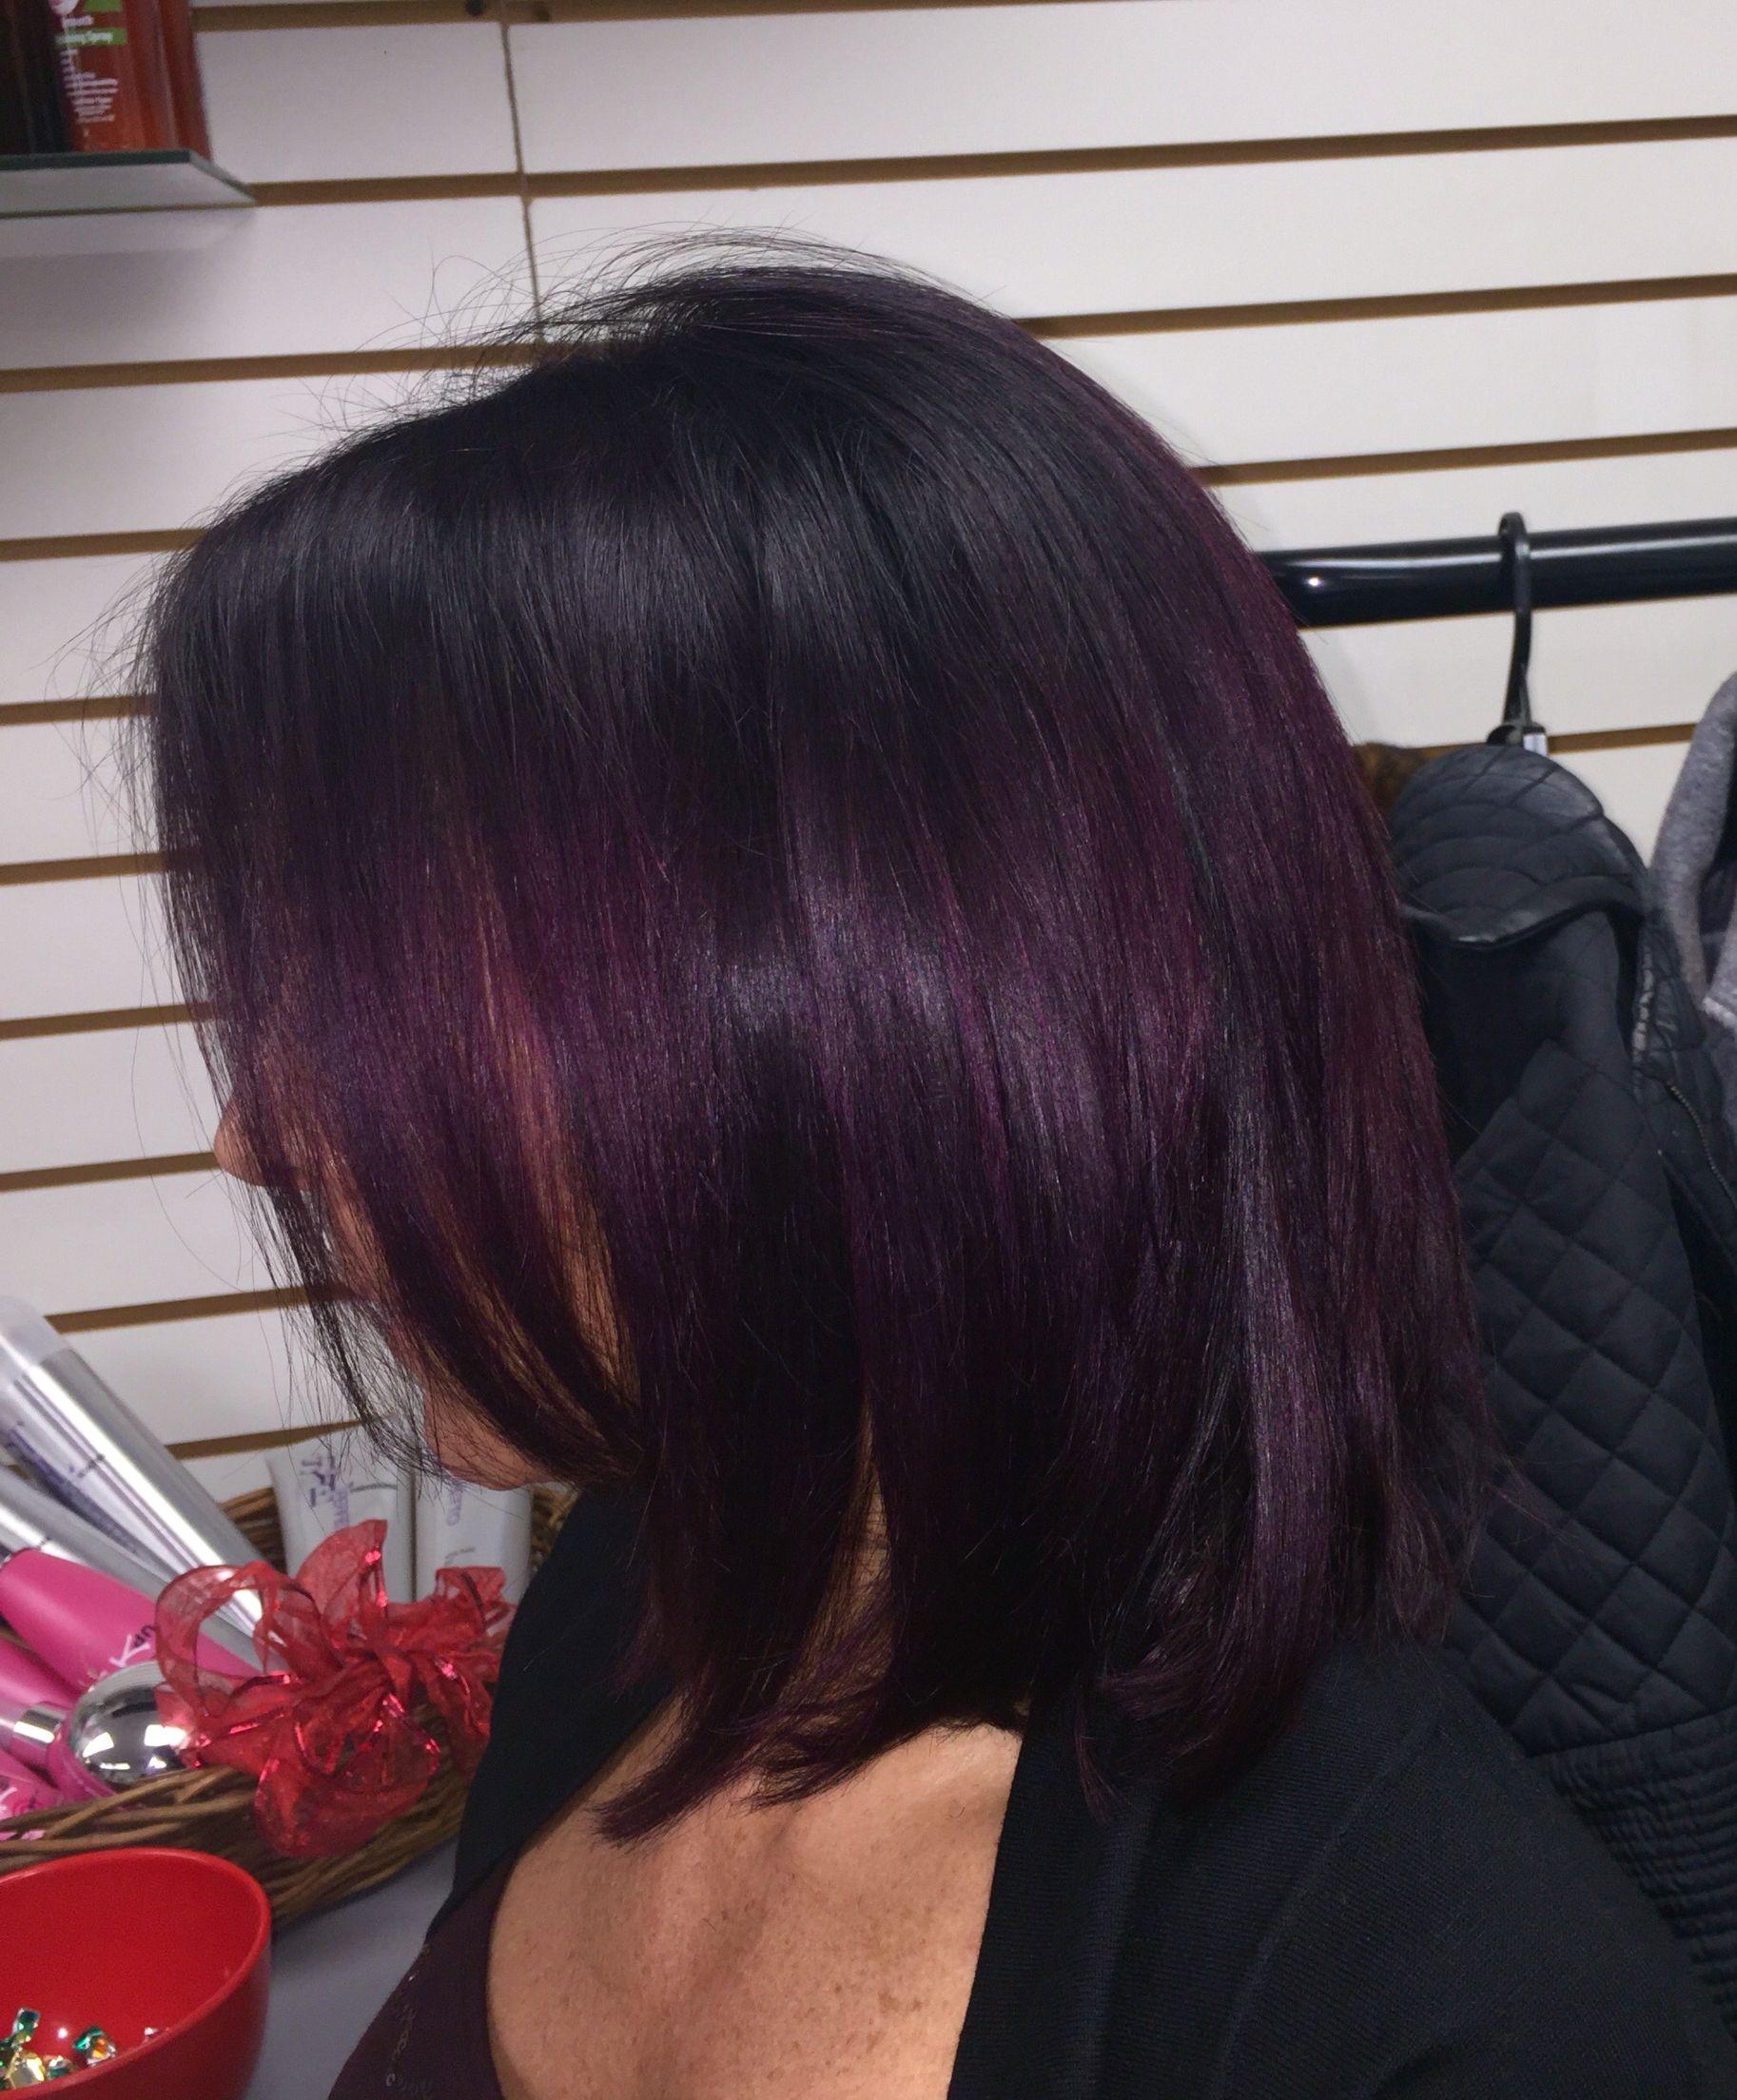 Eggplantviolet #Baco #Colorsplash #Kaaralusa #Jessbakis